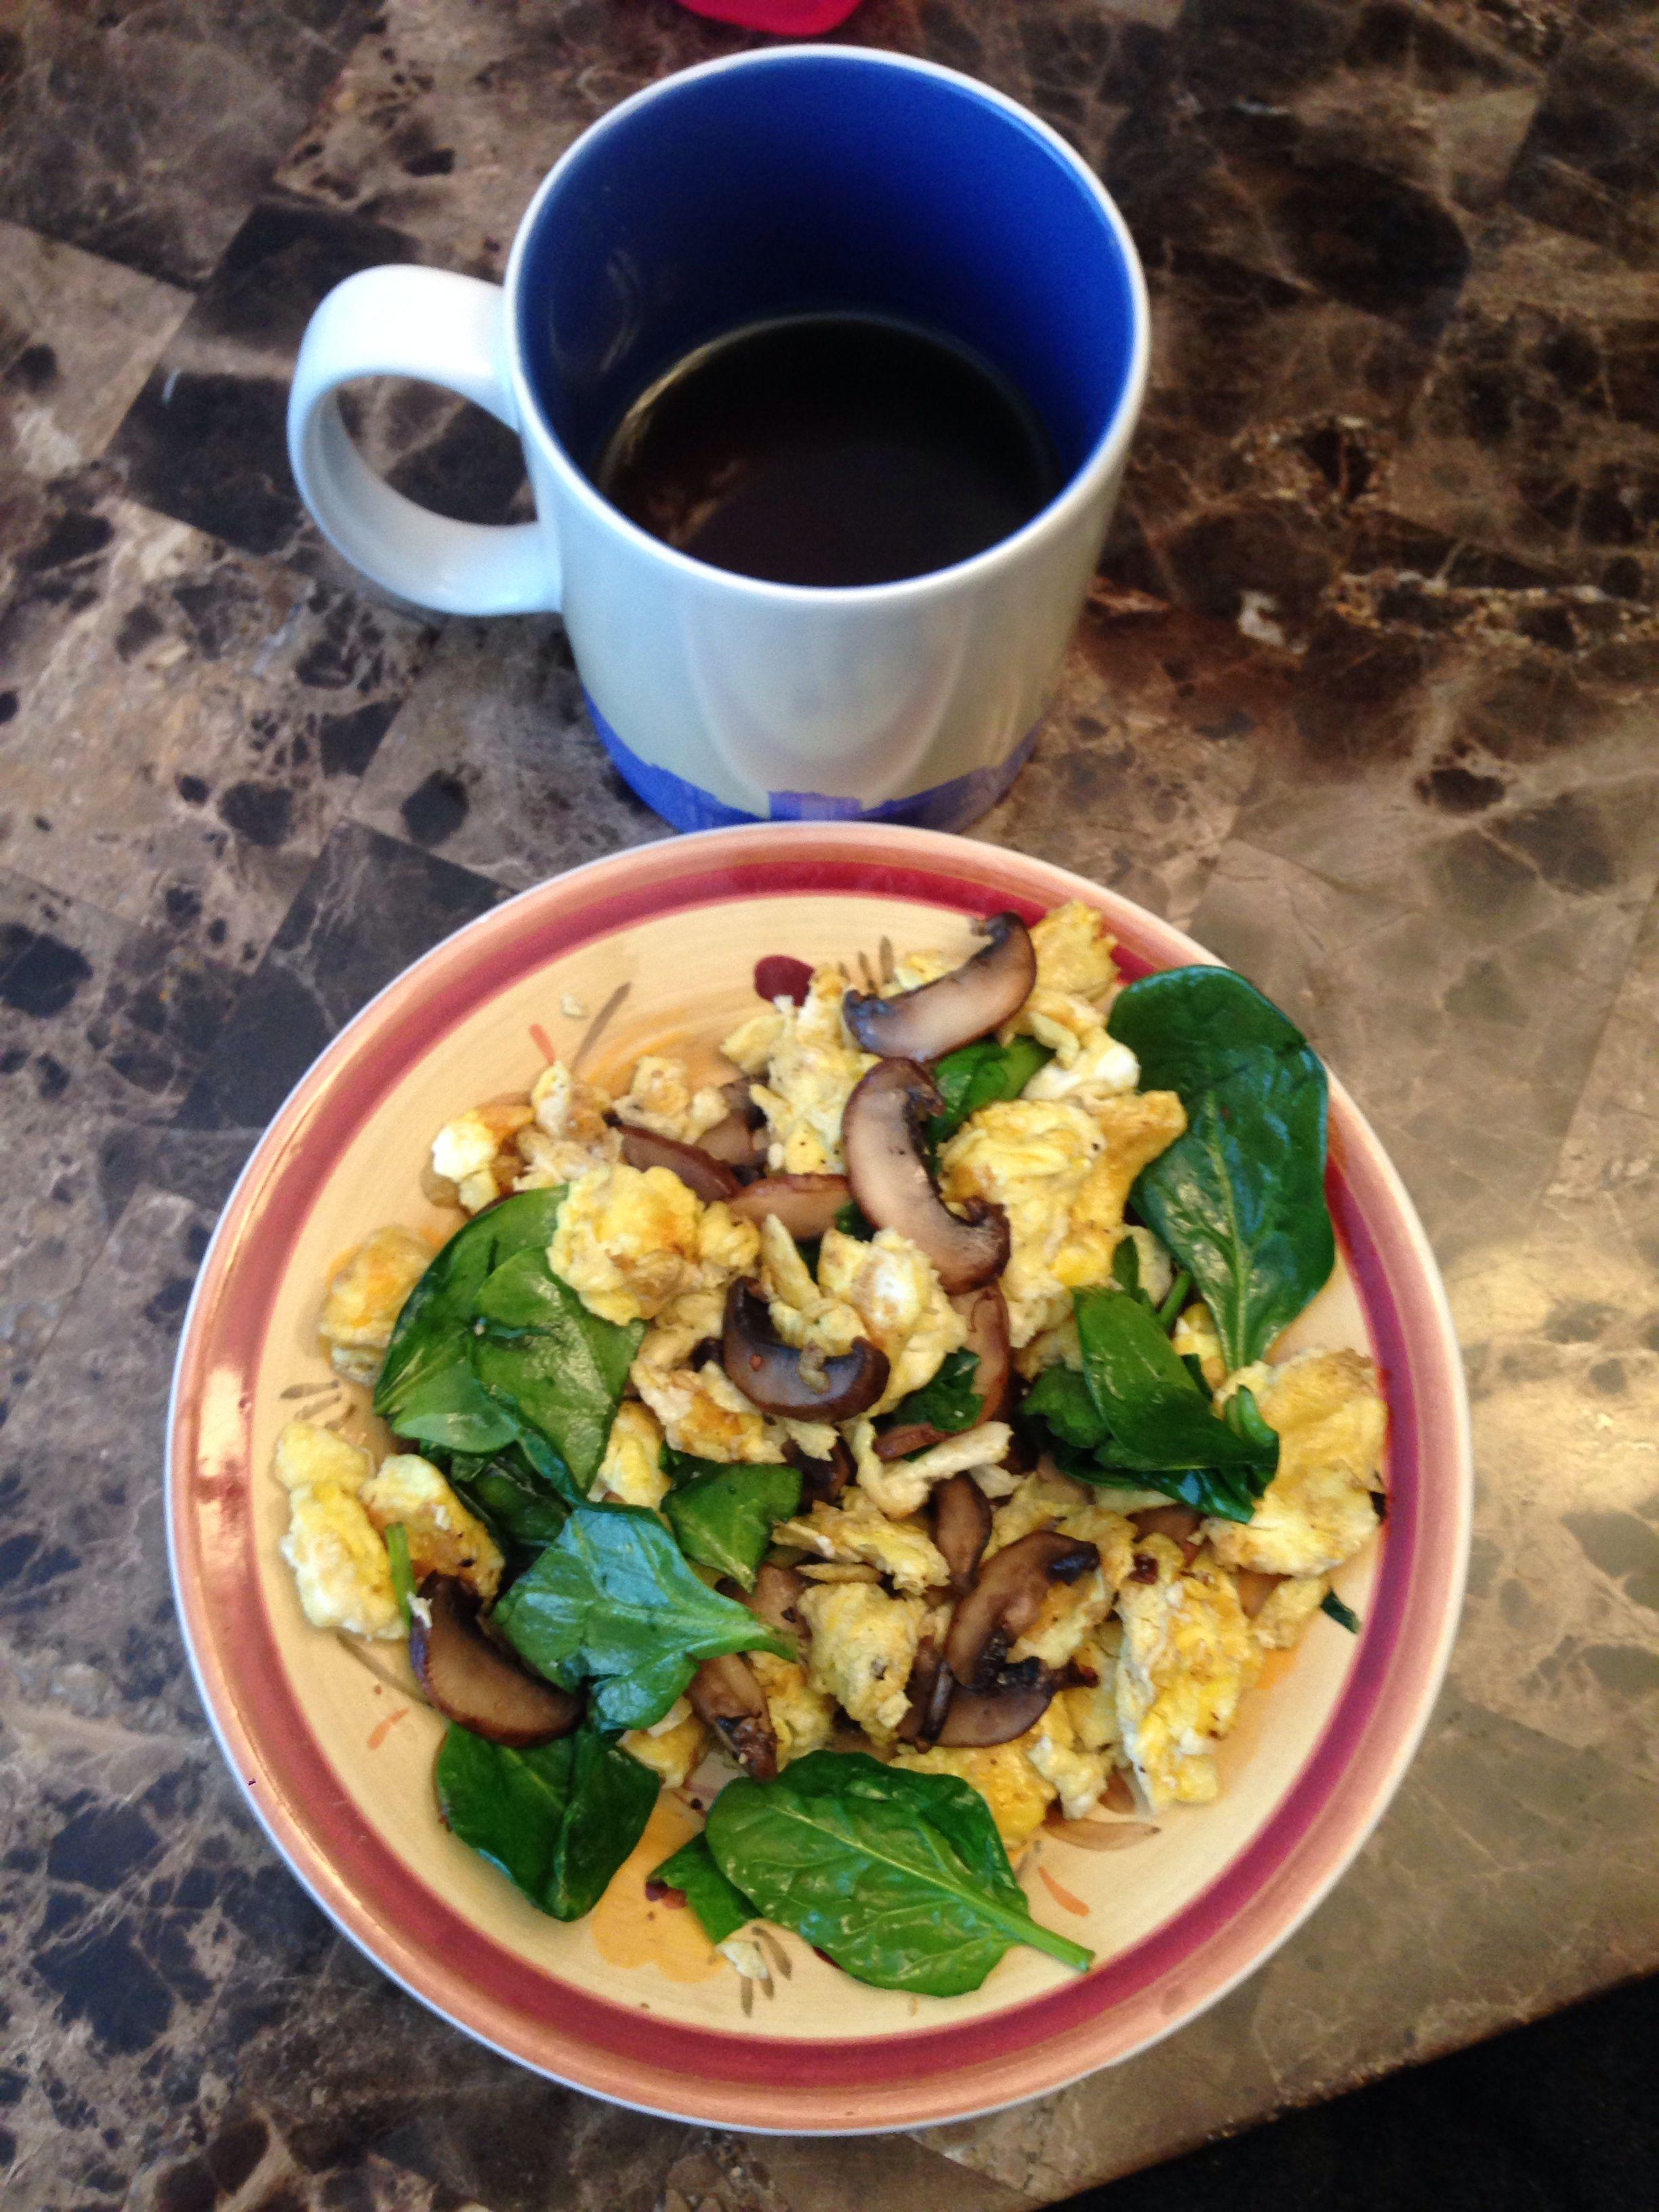 Easy breakfast 2 eggs, spinach, mushrooms and black coffee